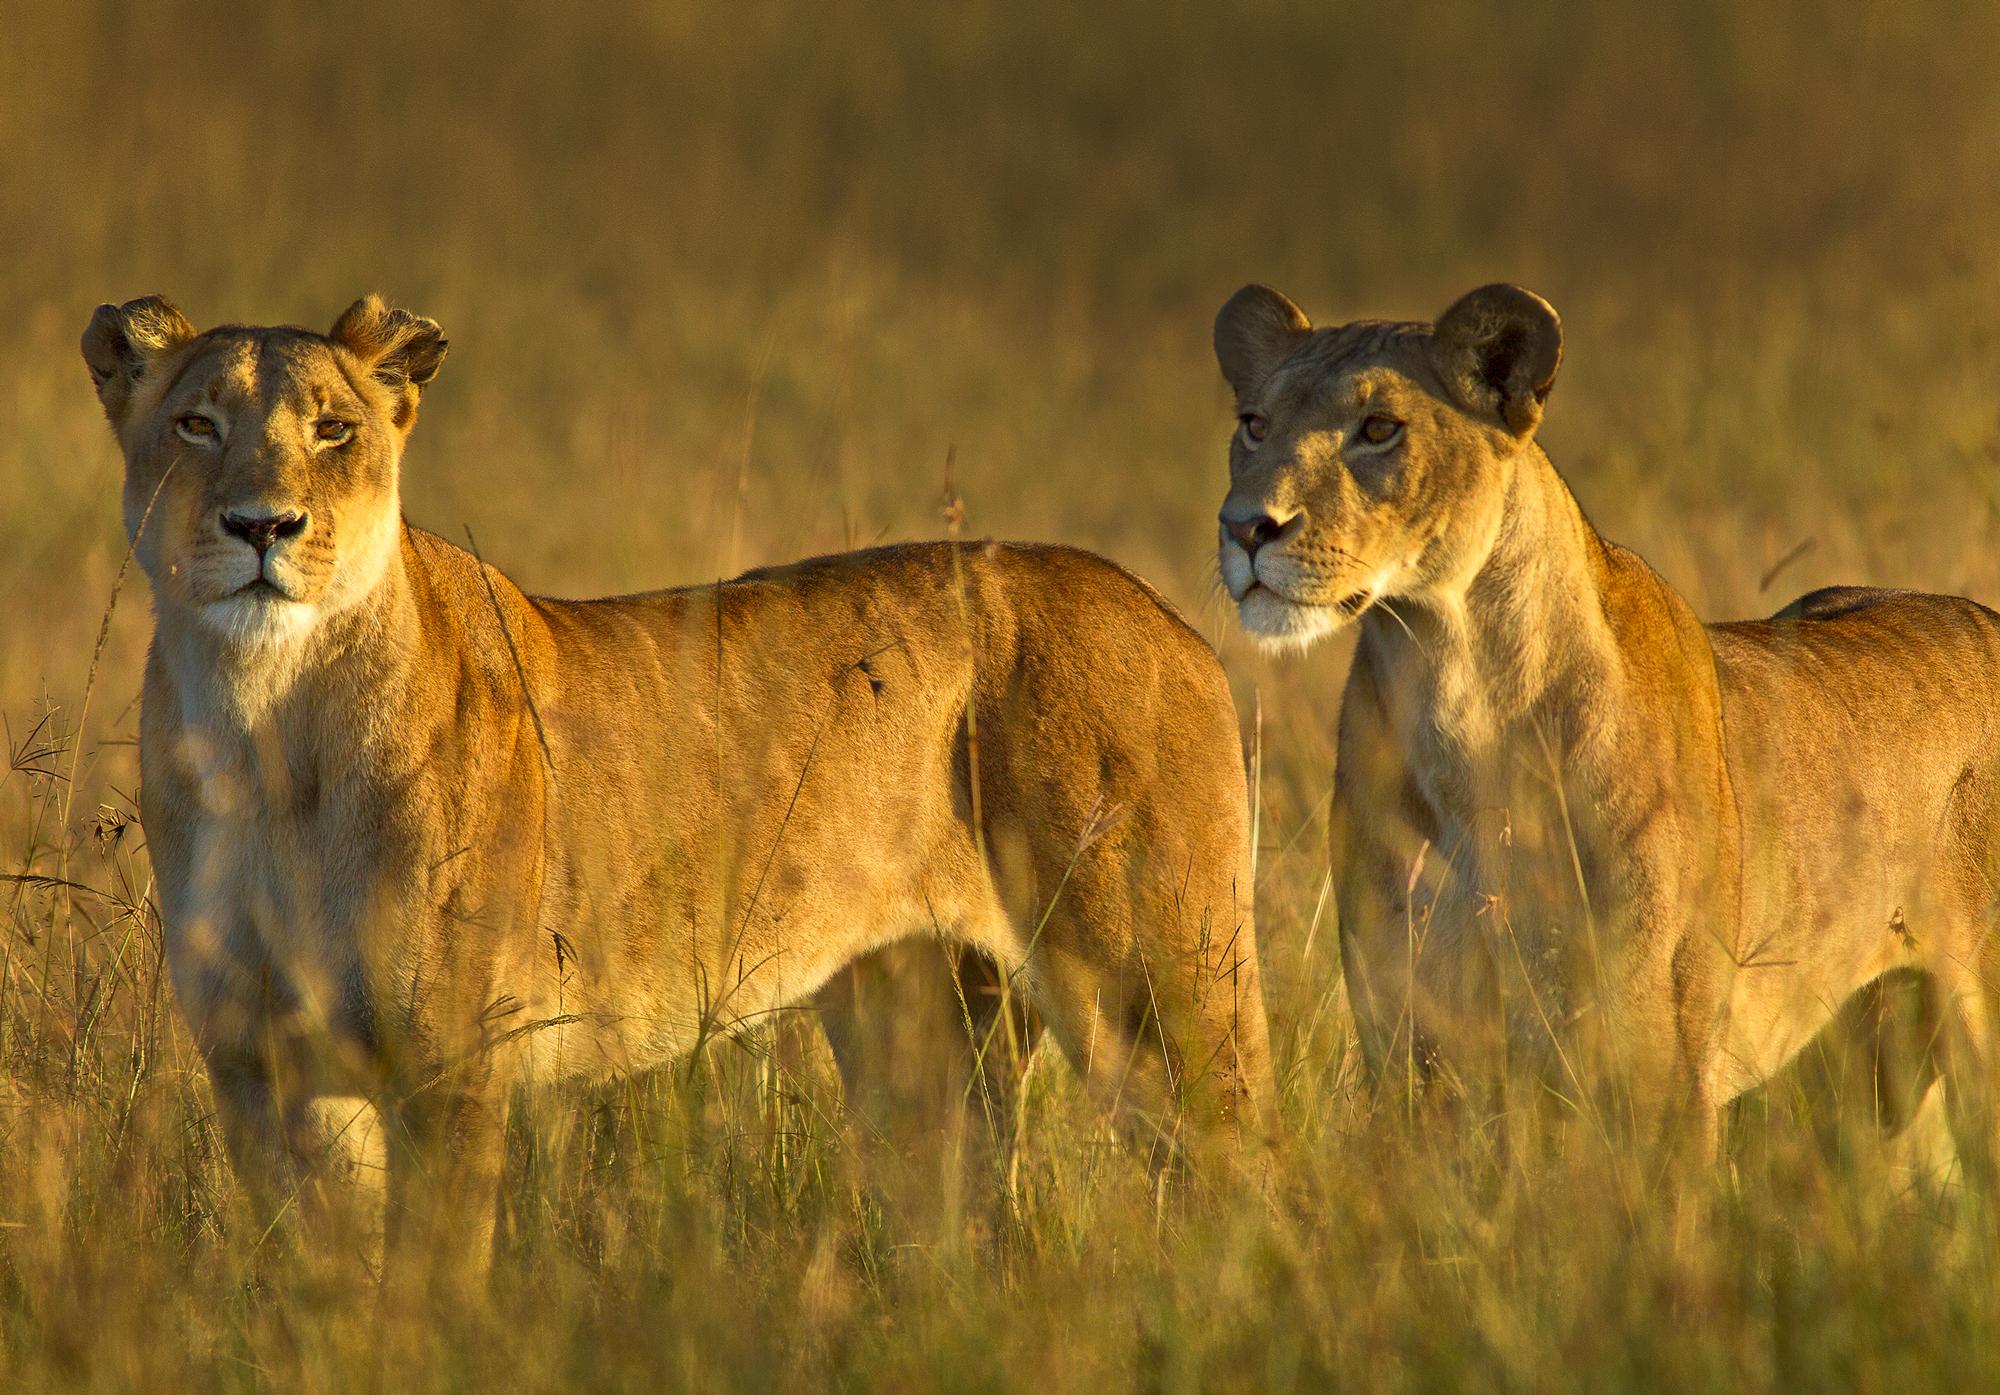 Studying Man Studying Animals Comparing Behavior